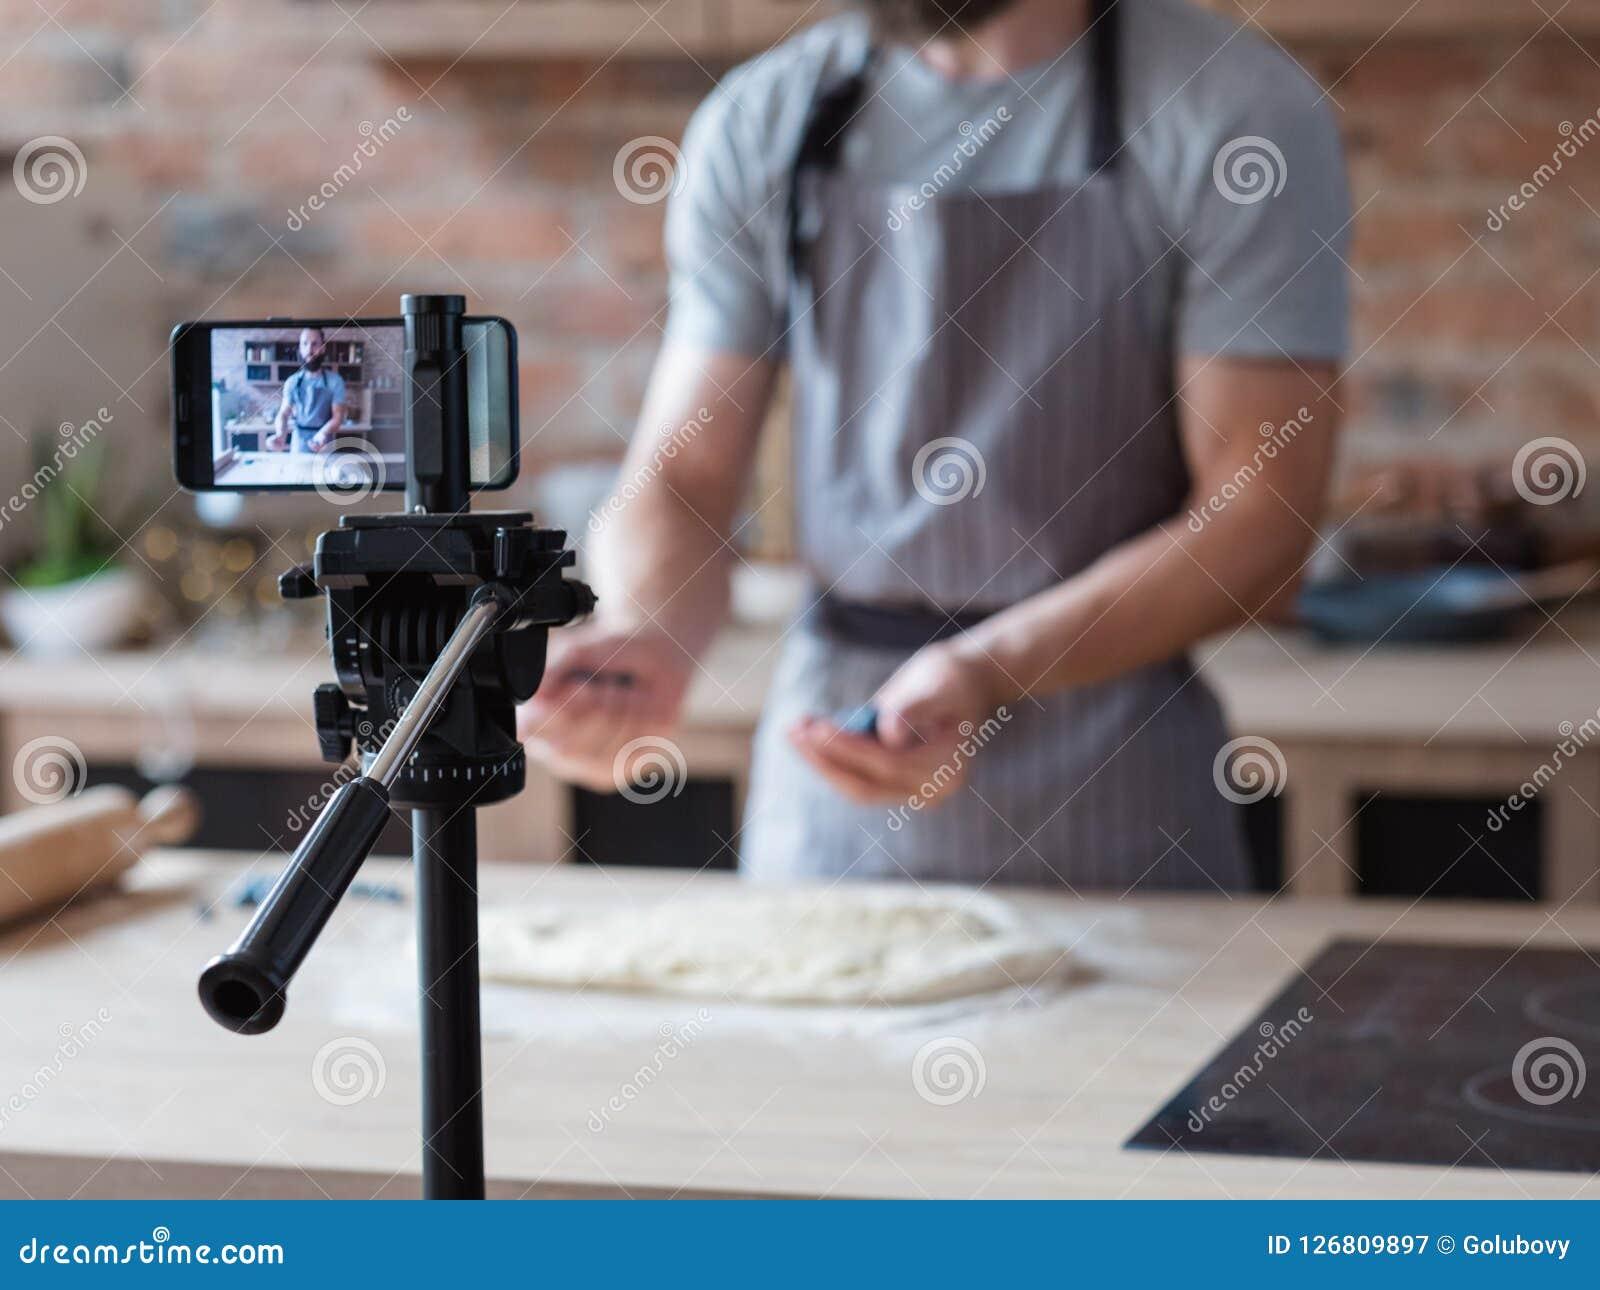 Technology video shoot phone camera food blogger